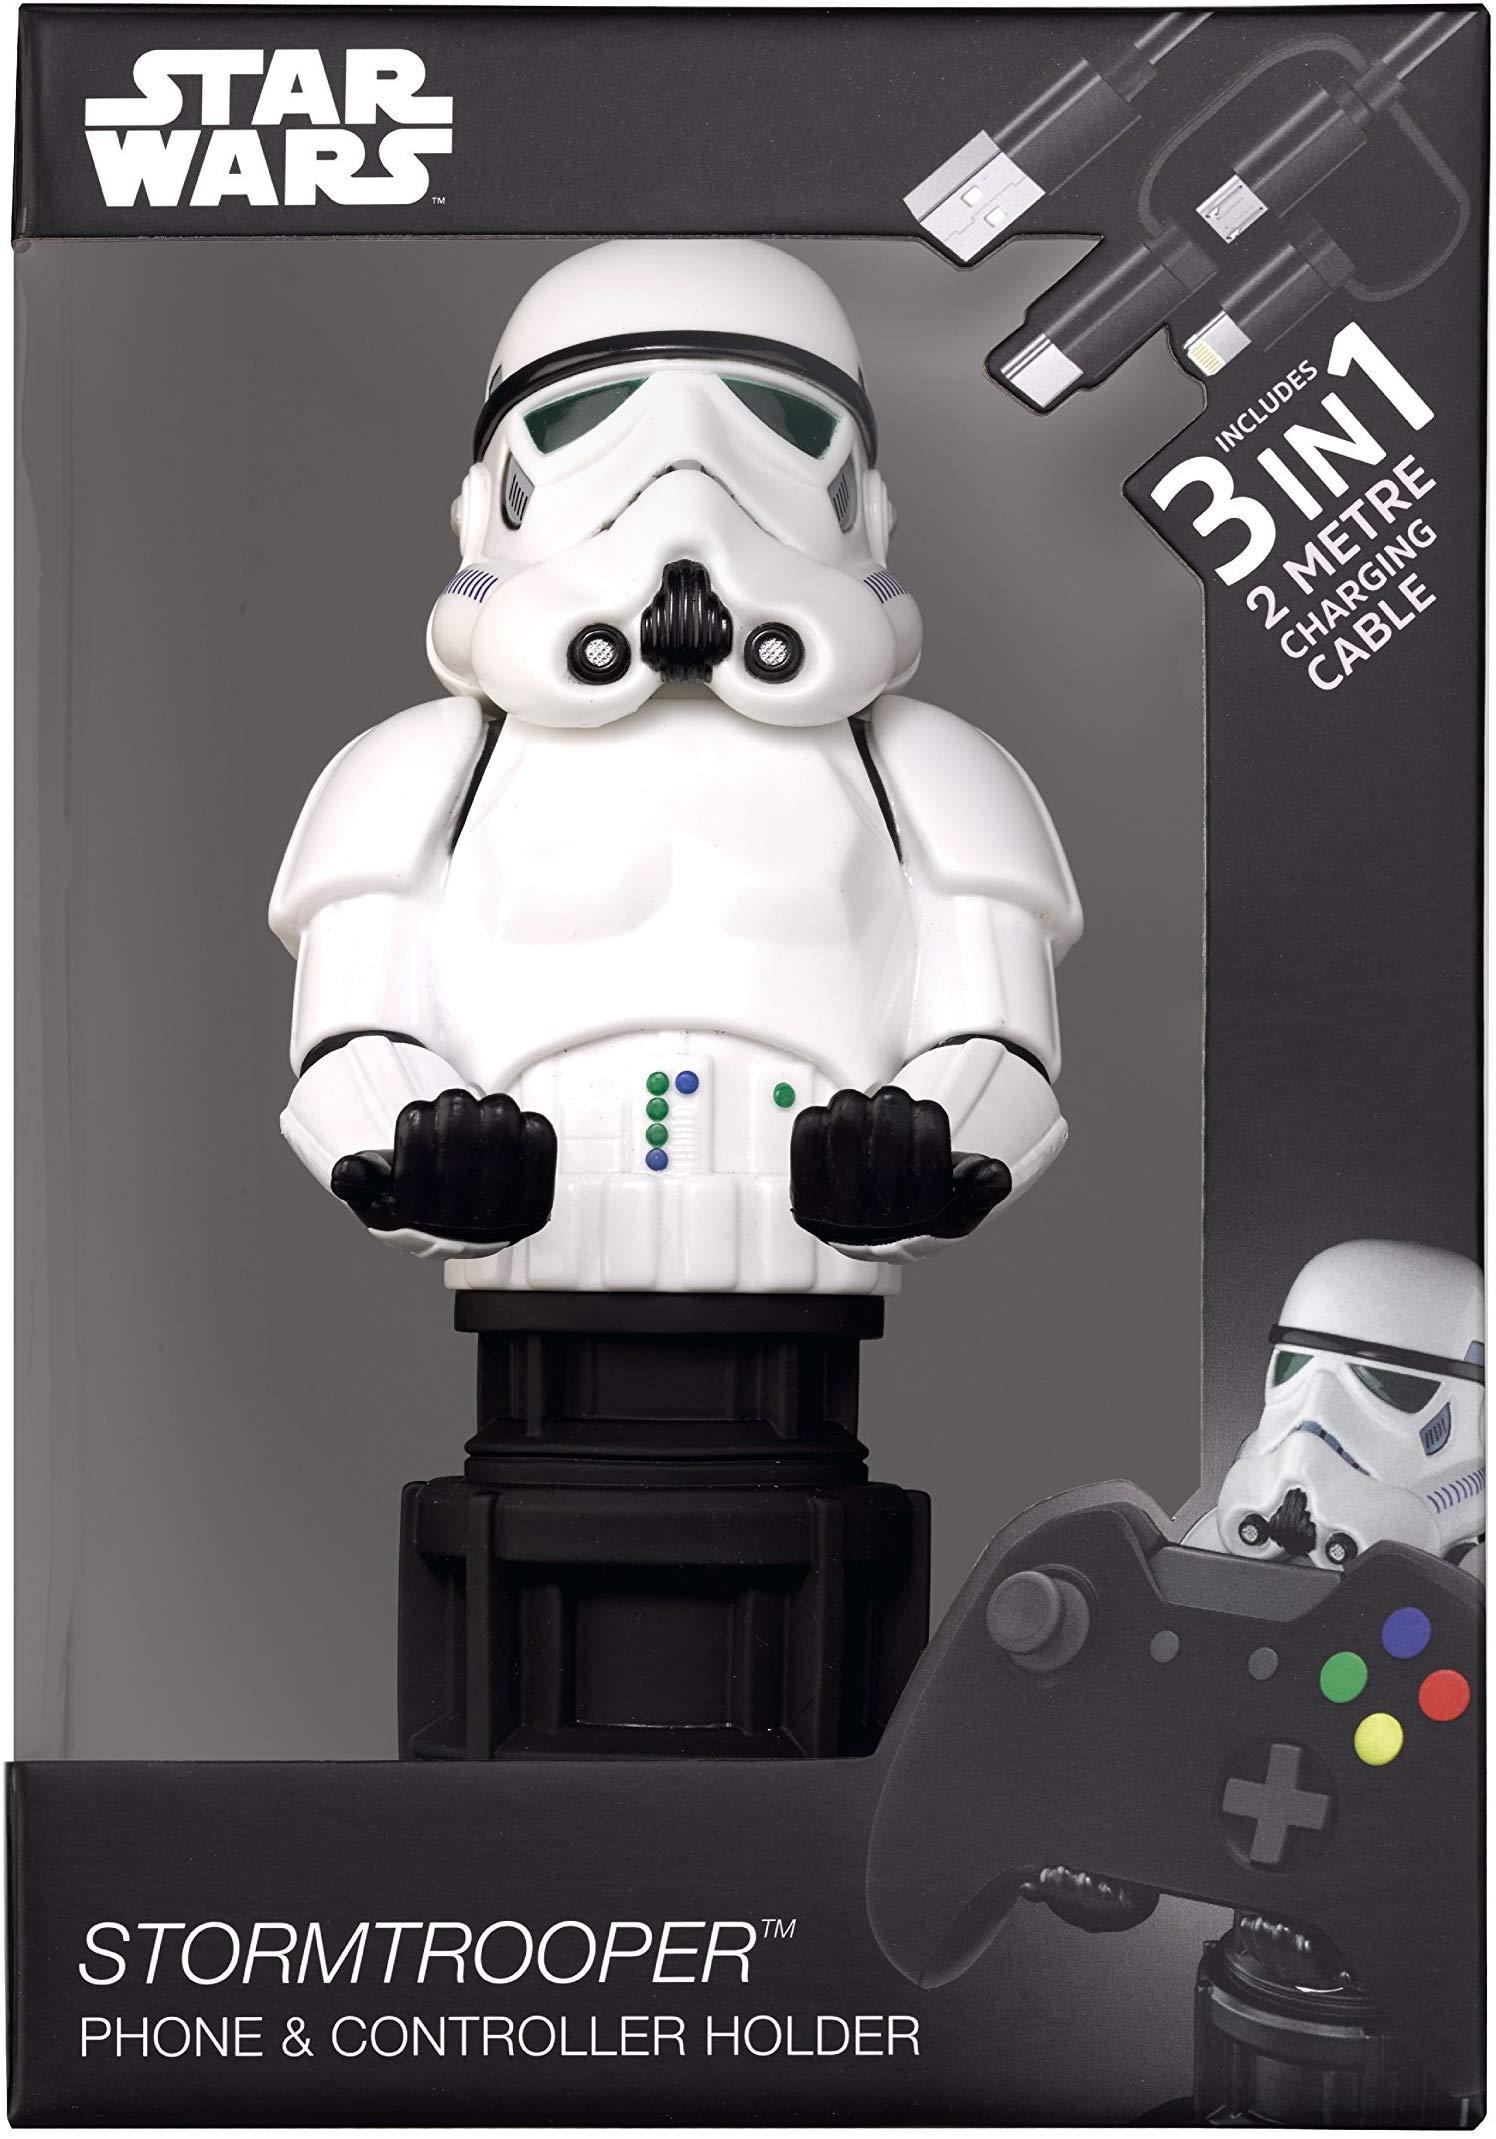 Star Wars Stormtrooper Telefon/Kontroller tartó (20cm)